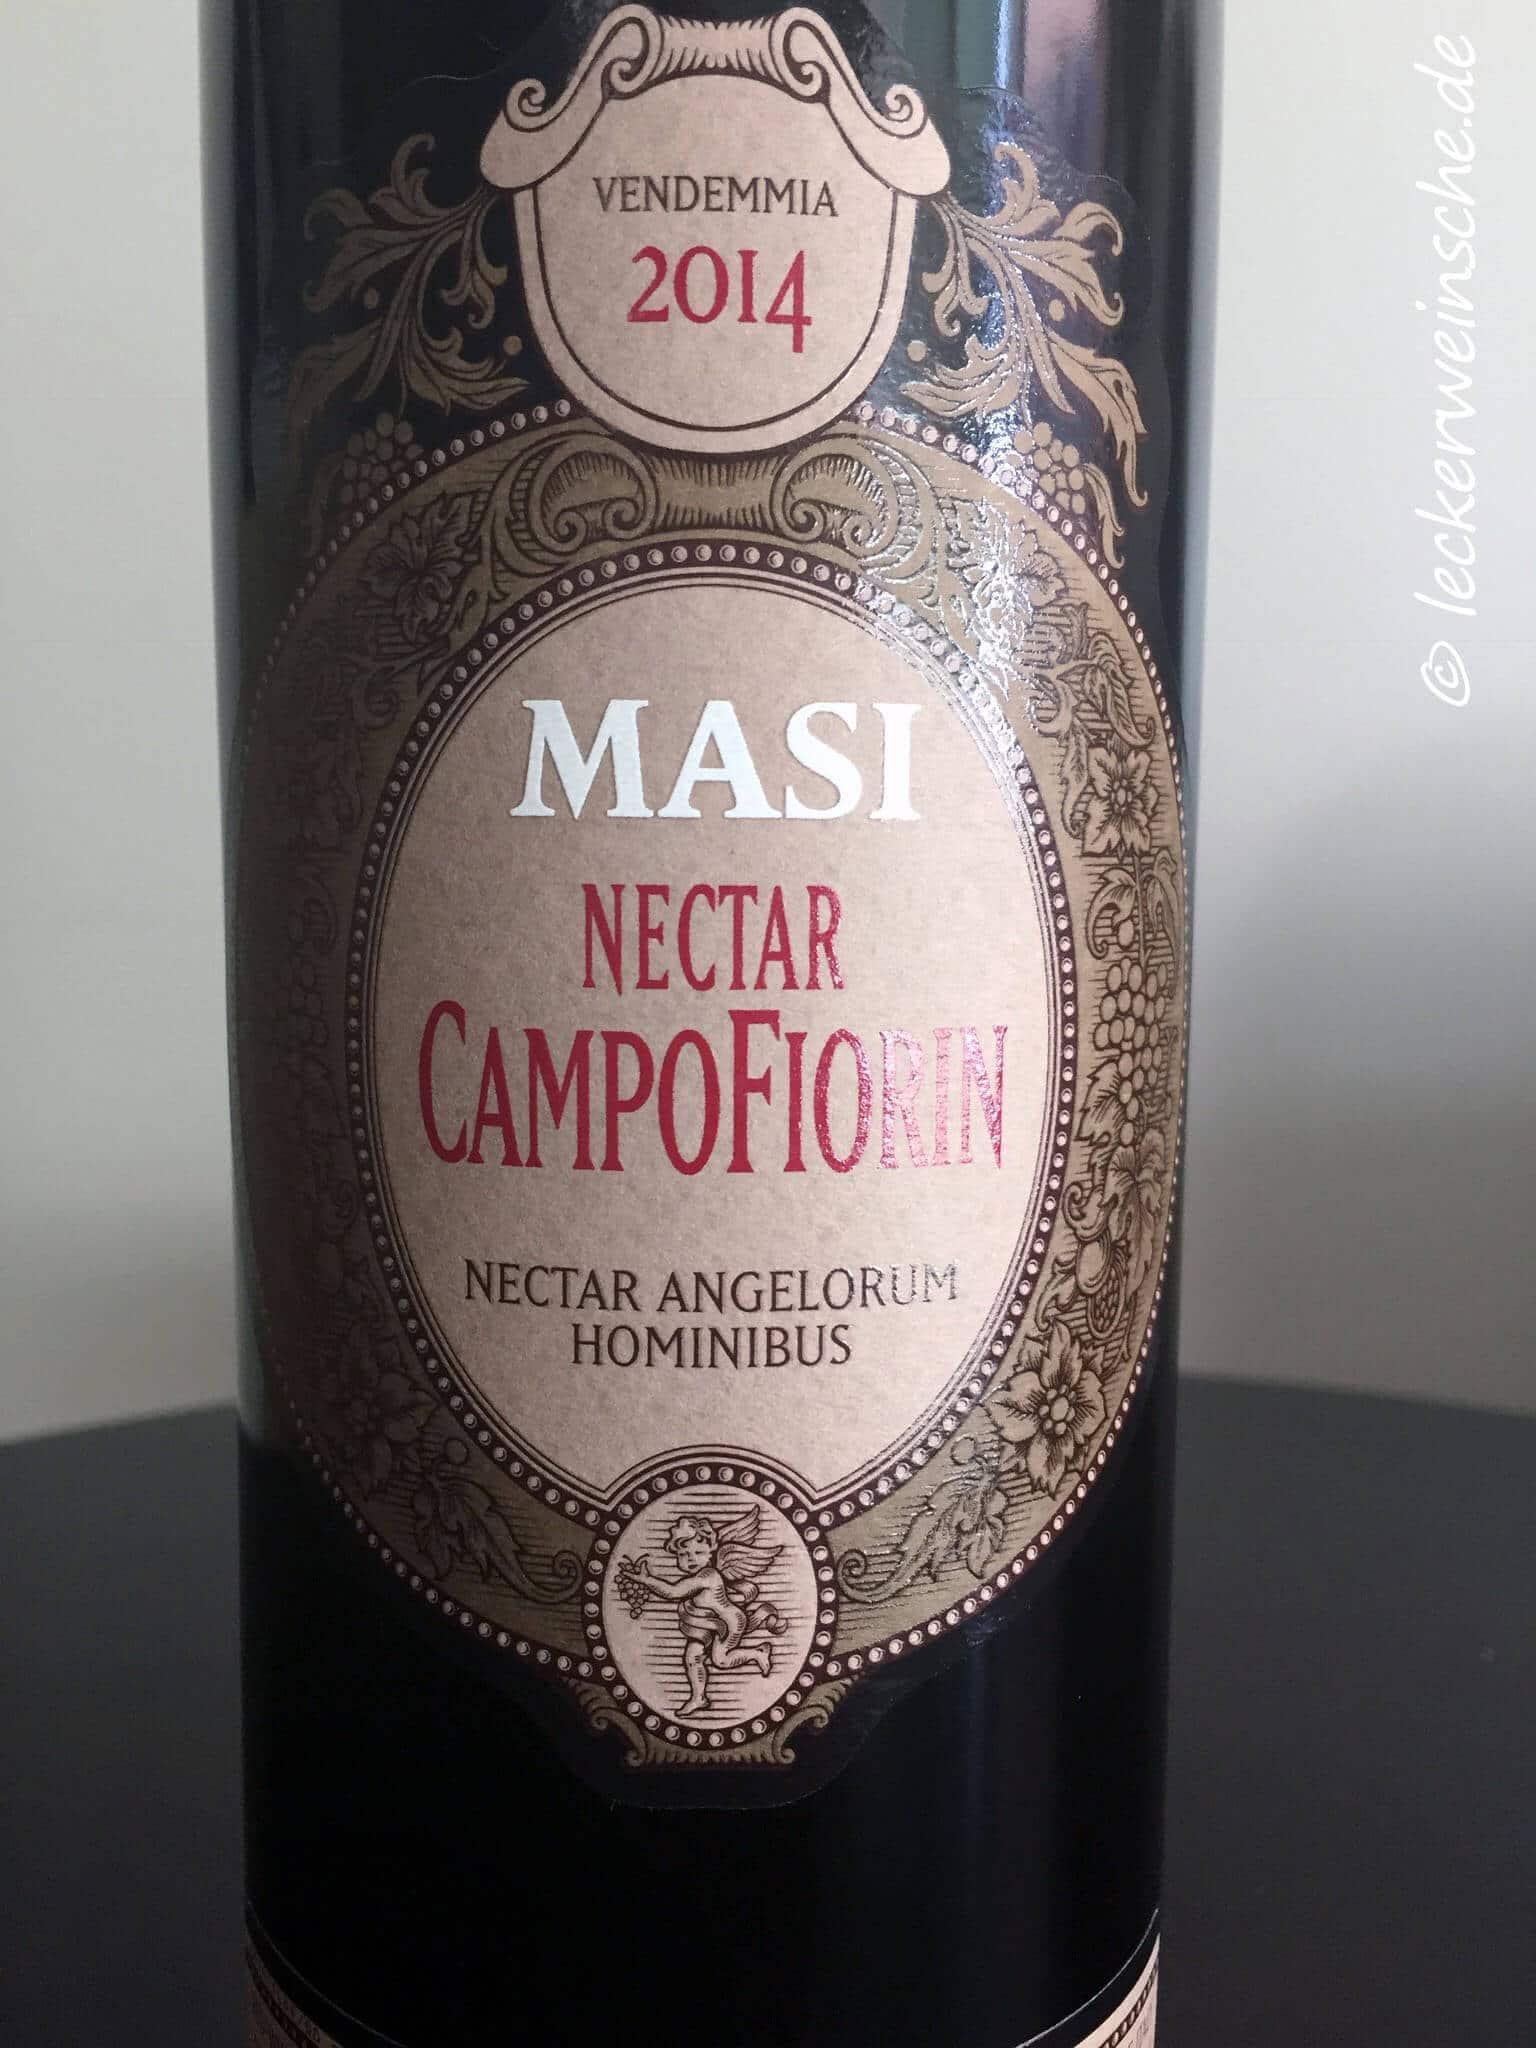 Masi Nectar CampoFiorin 2014